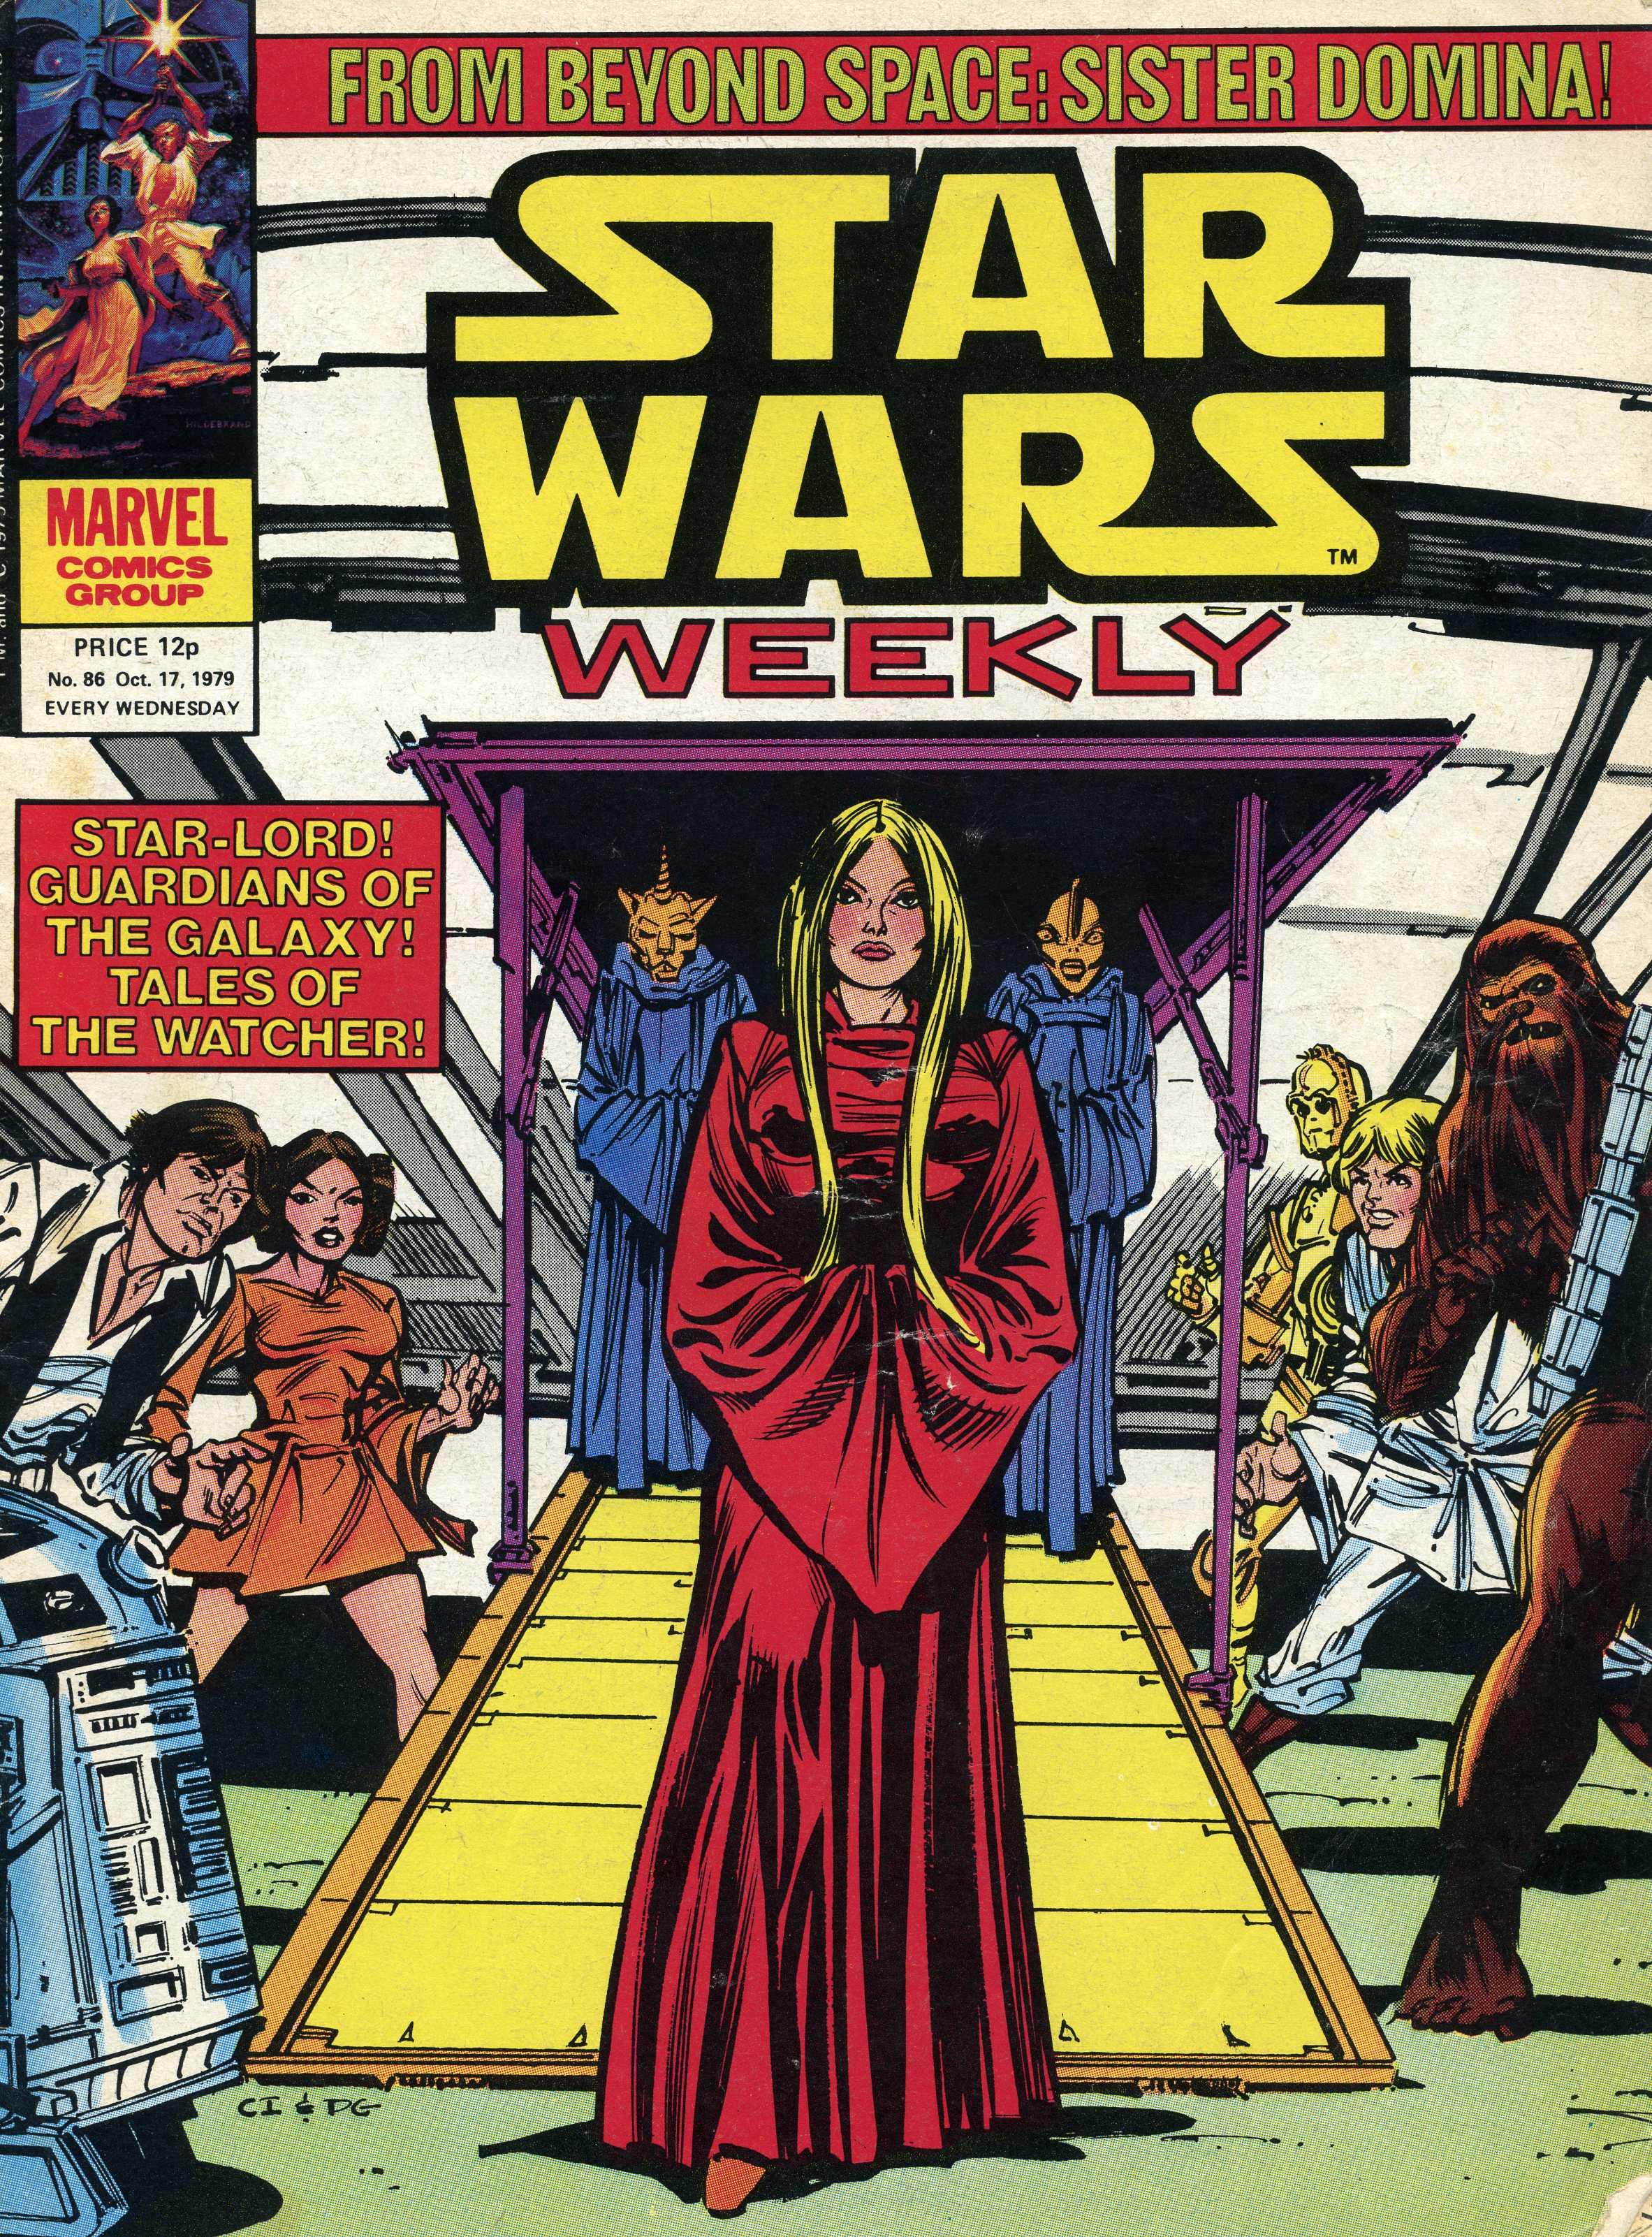 Star Wars Weekly 86